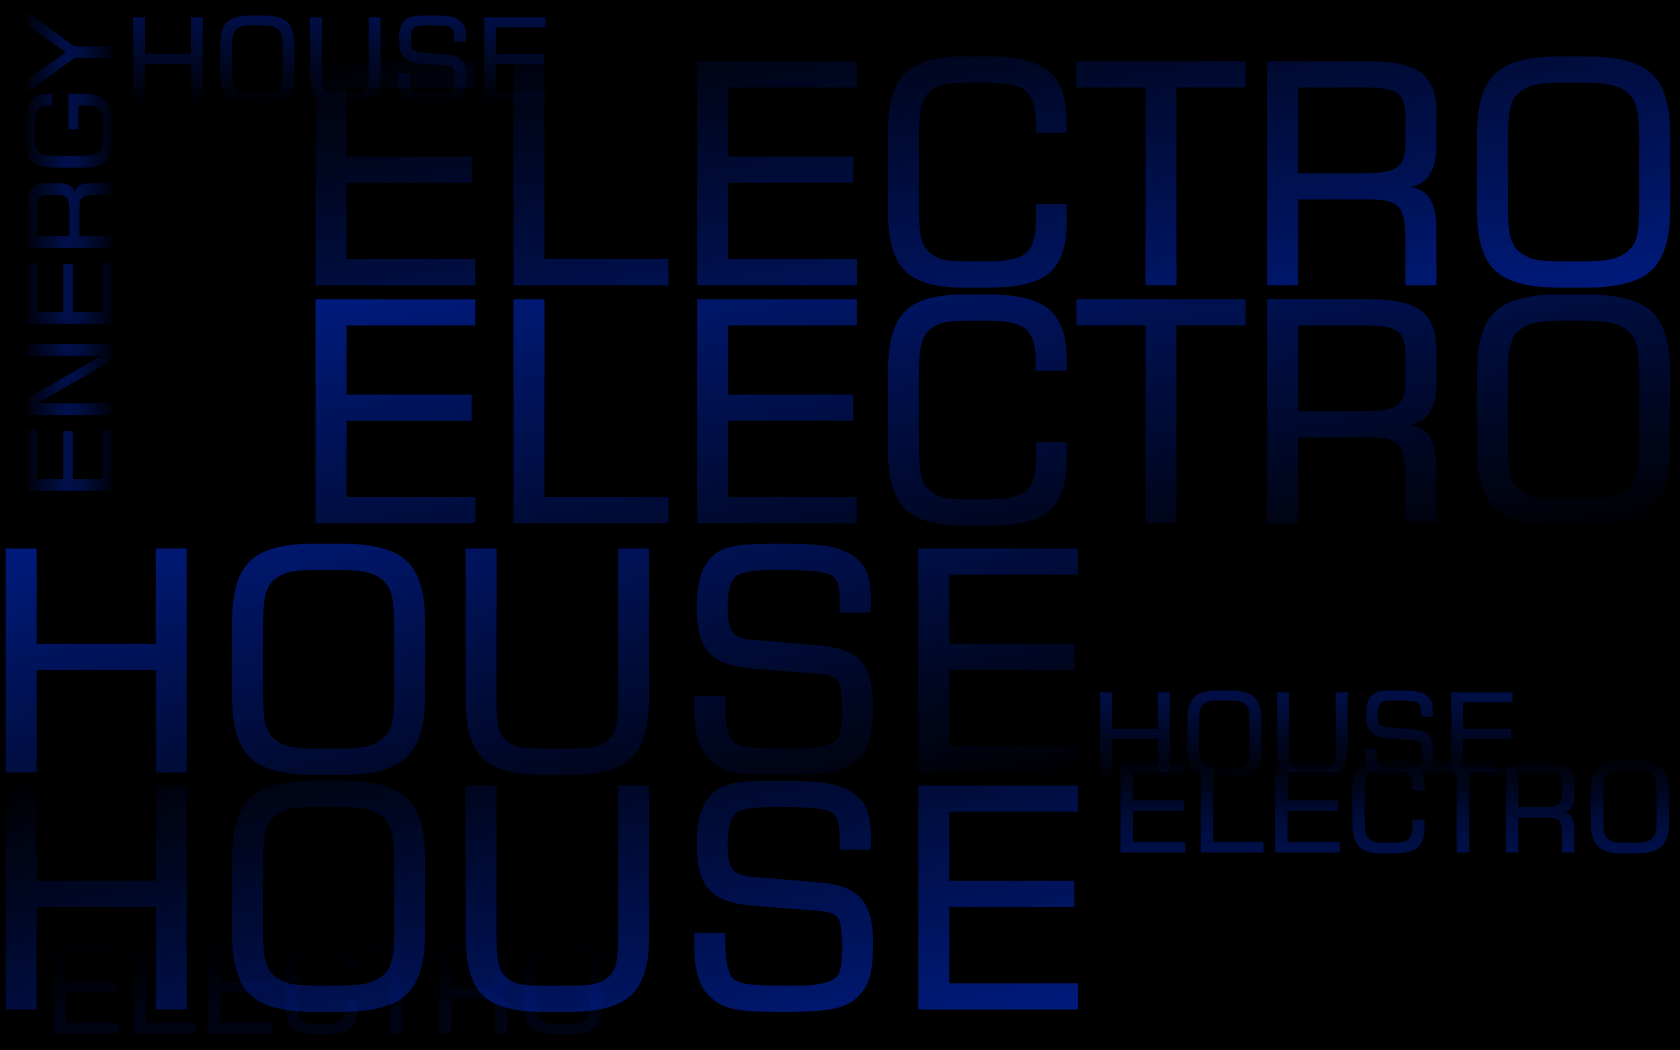 Electro house music wallpaper wallpapersafari for Us house music